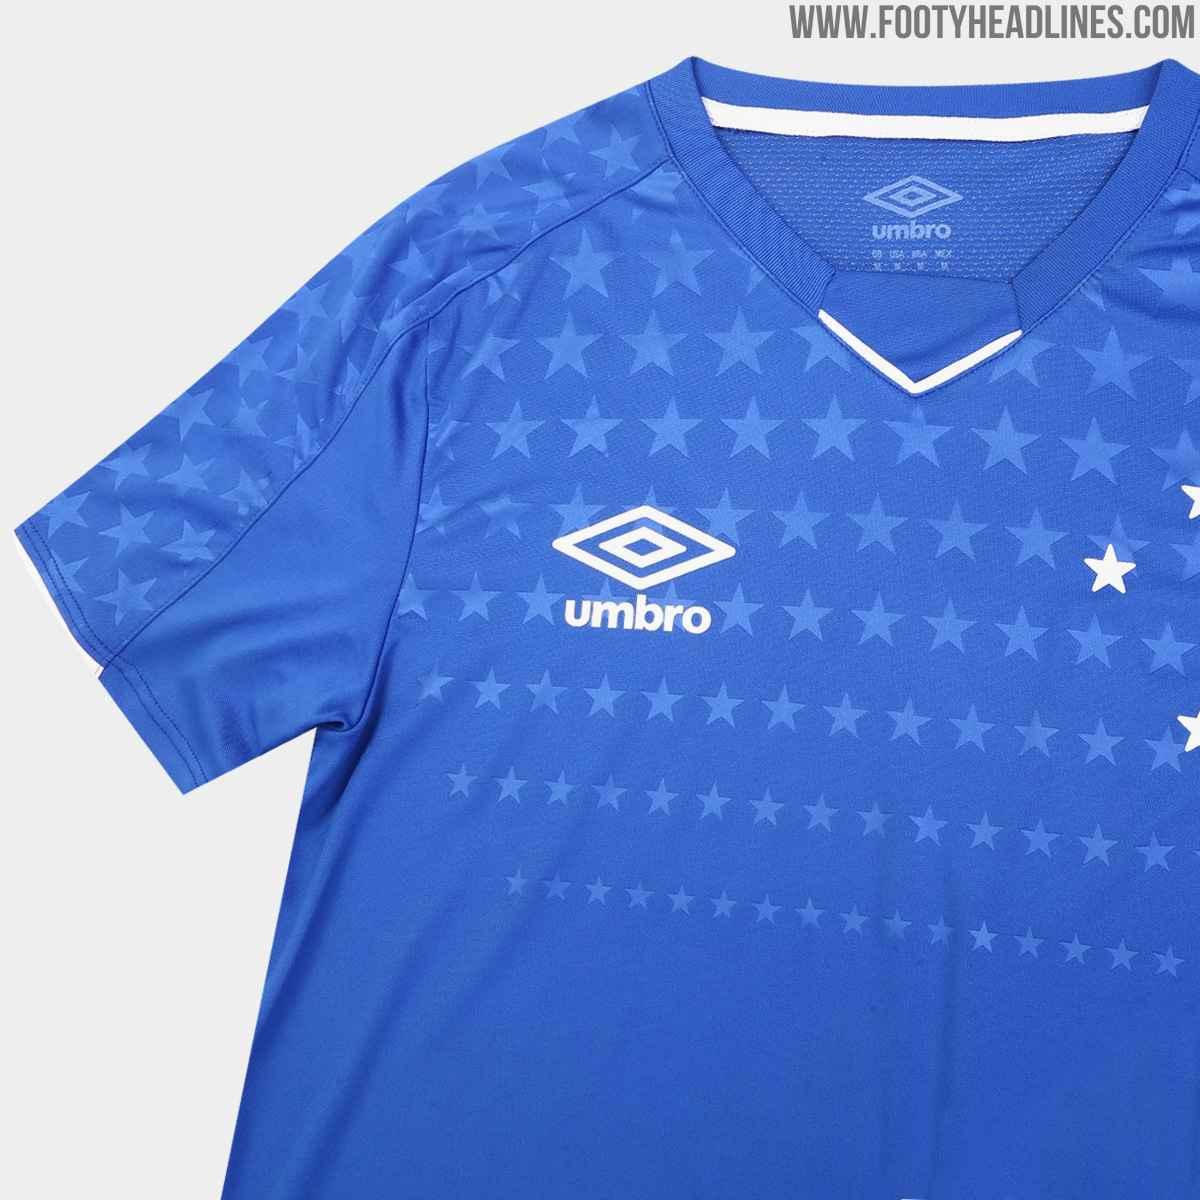 Umbro Cruzeiro 2019 Home U0026 Away Kits Released Footy